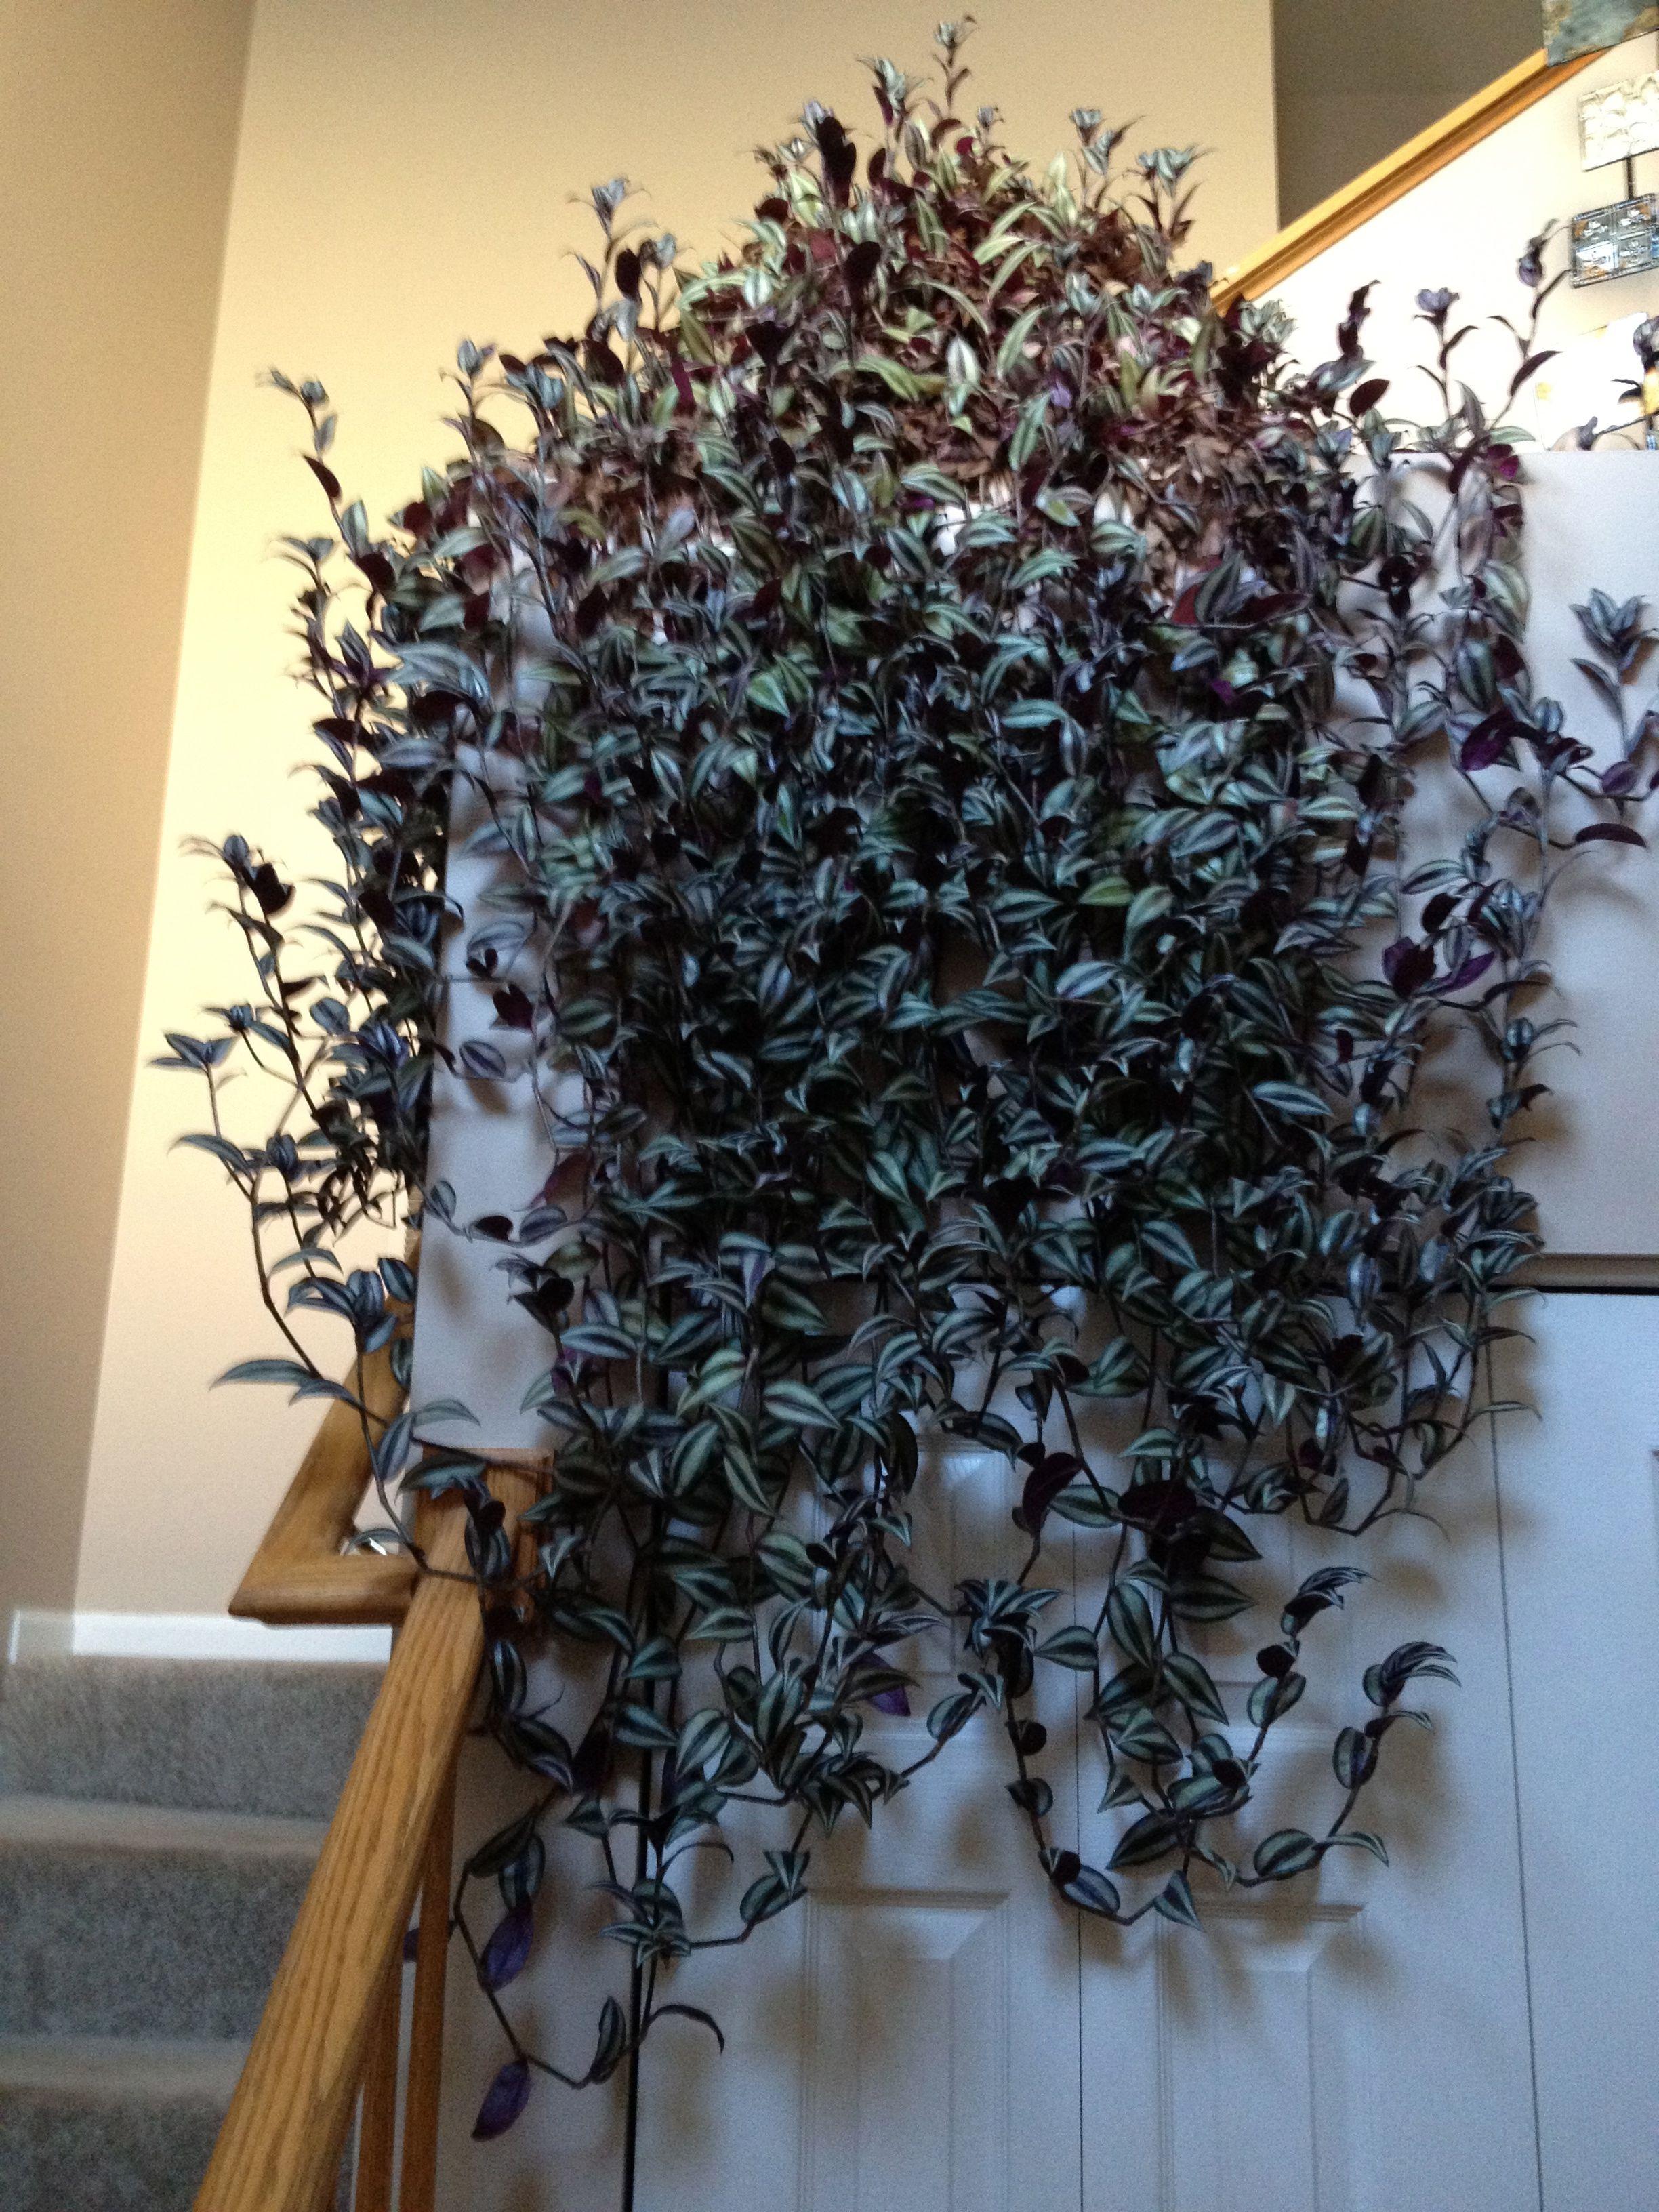 zebrina pendula wandering jew my plants wandering jew outdoor plants indoor plants. Black Bedroom Furniture Sets. Home Design Ideas